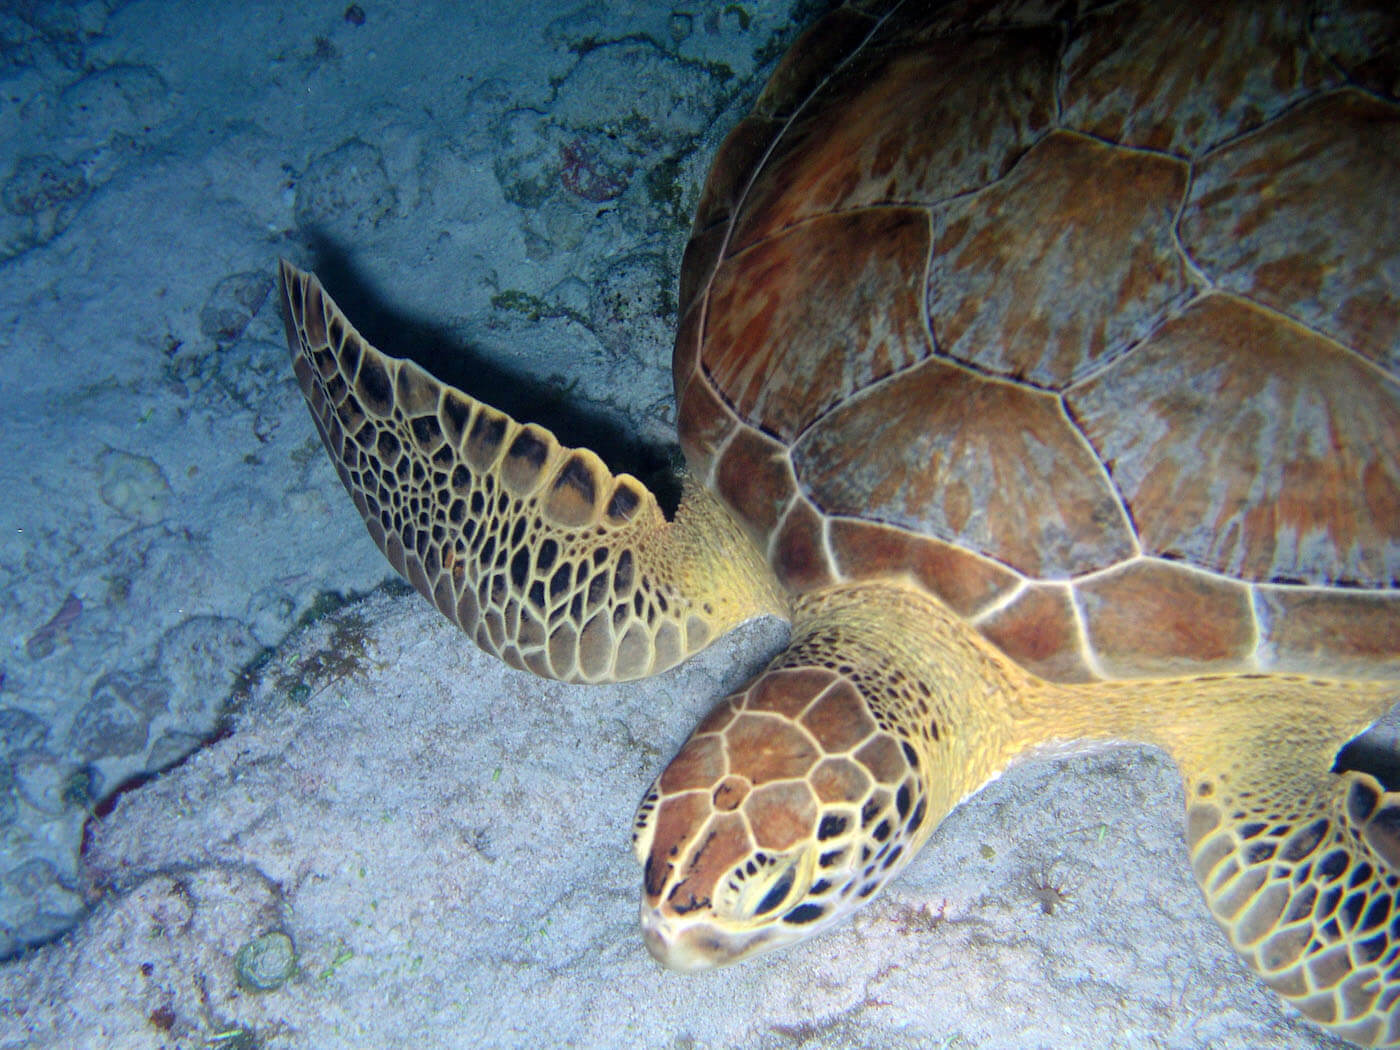 Isla Mujeres Night Scuba Diving Squalo Adventures-4